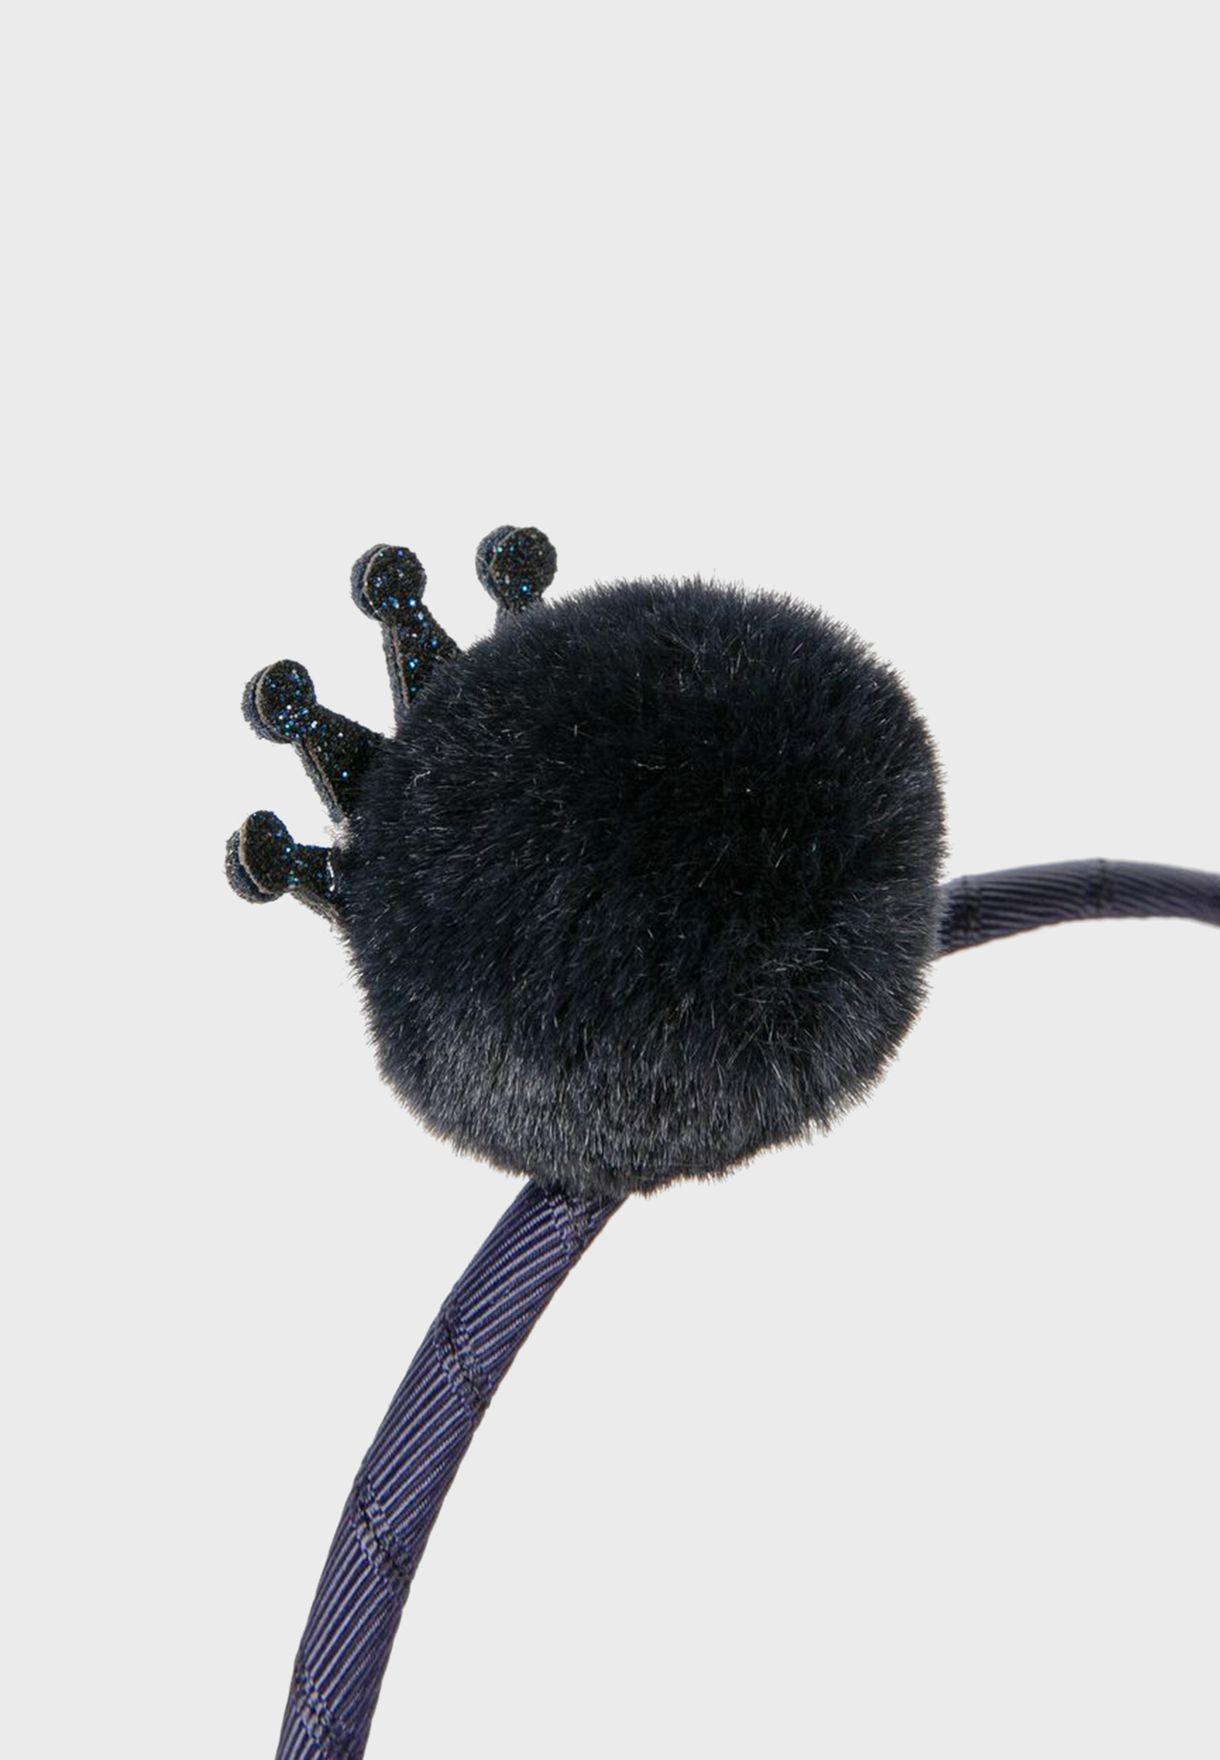 Kids Pompom Detail Headband